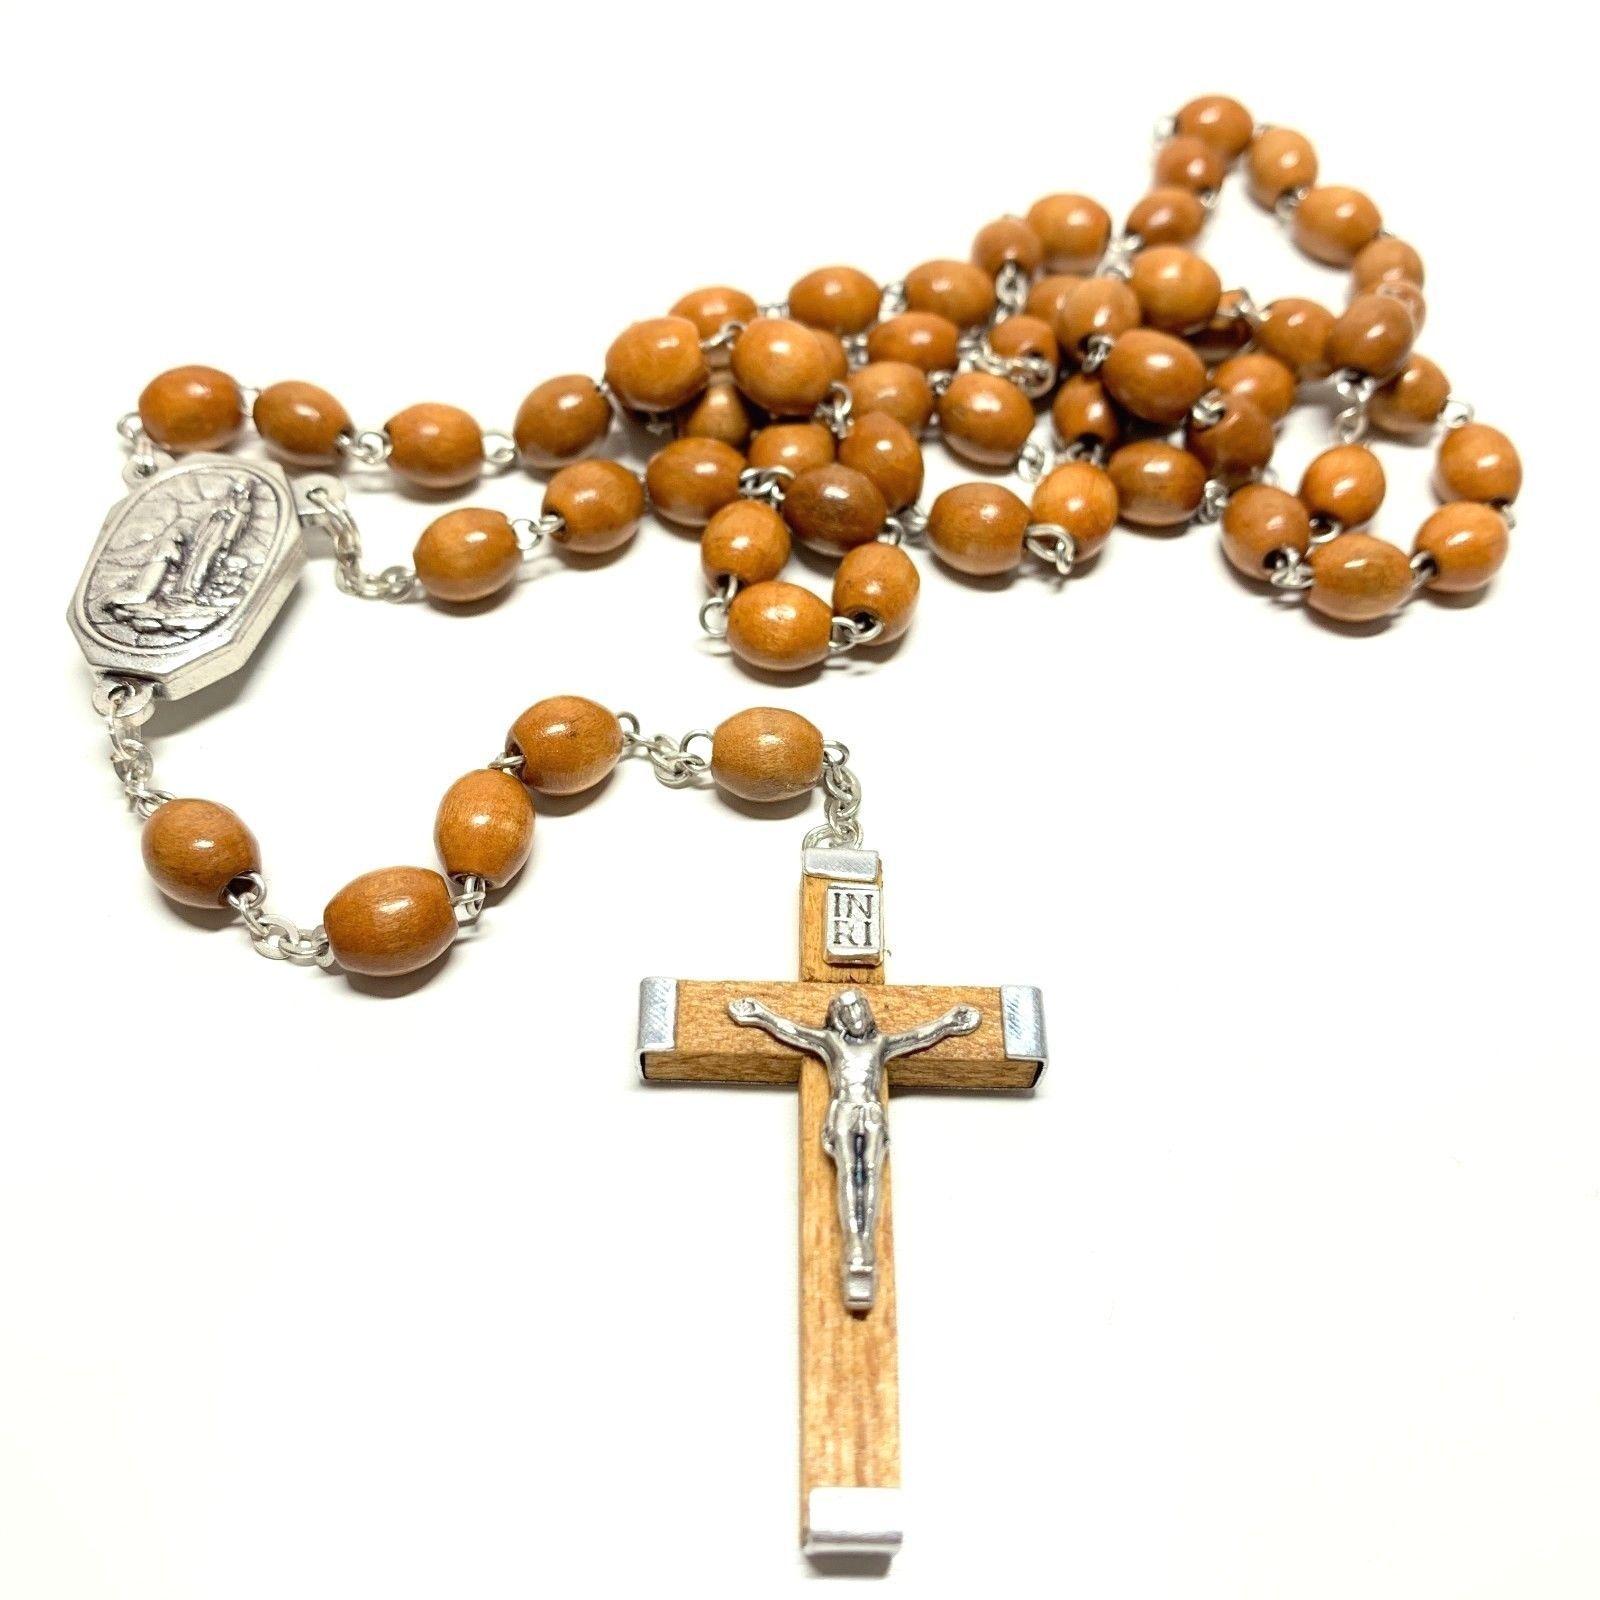 St Francis rosary beads medal pendant gold tone Catholic